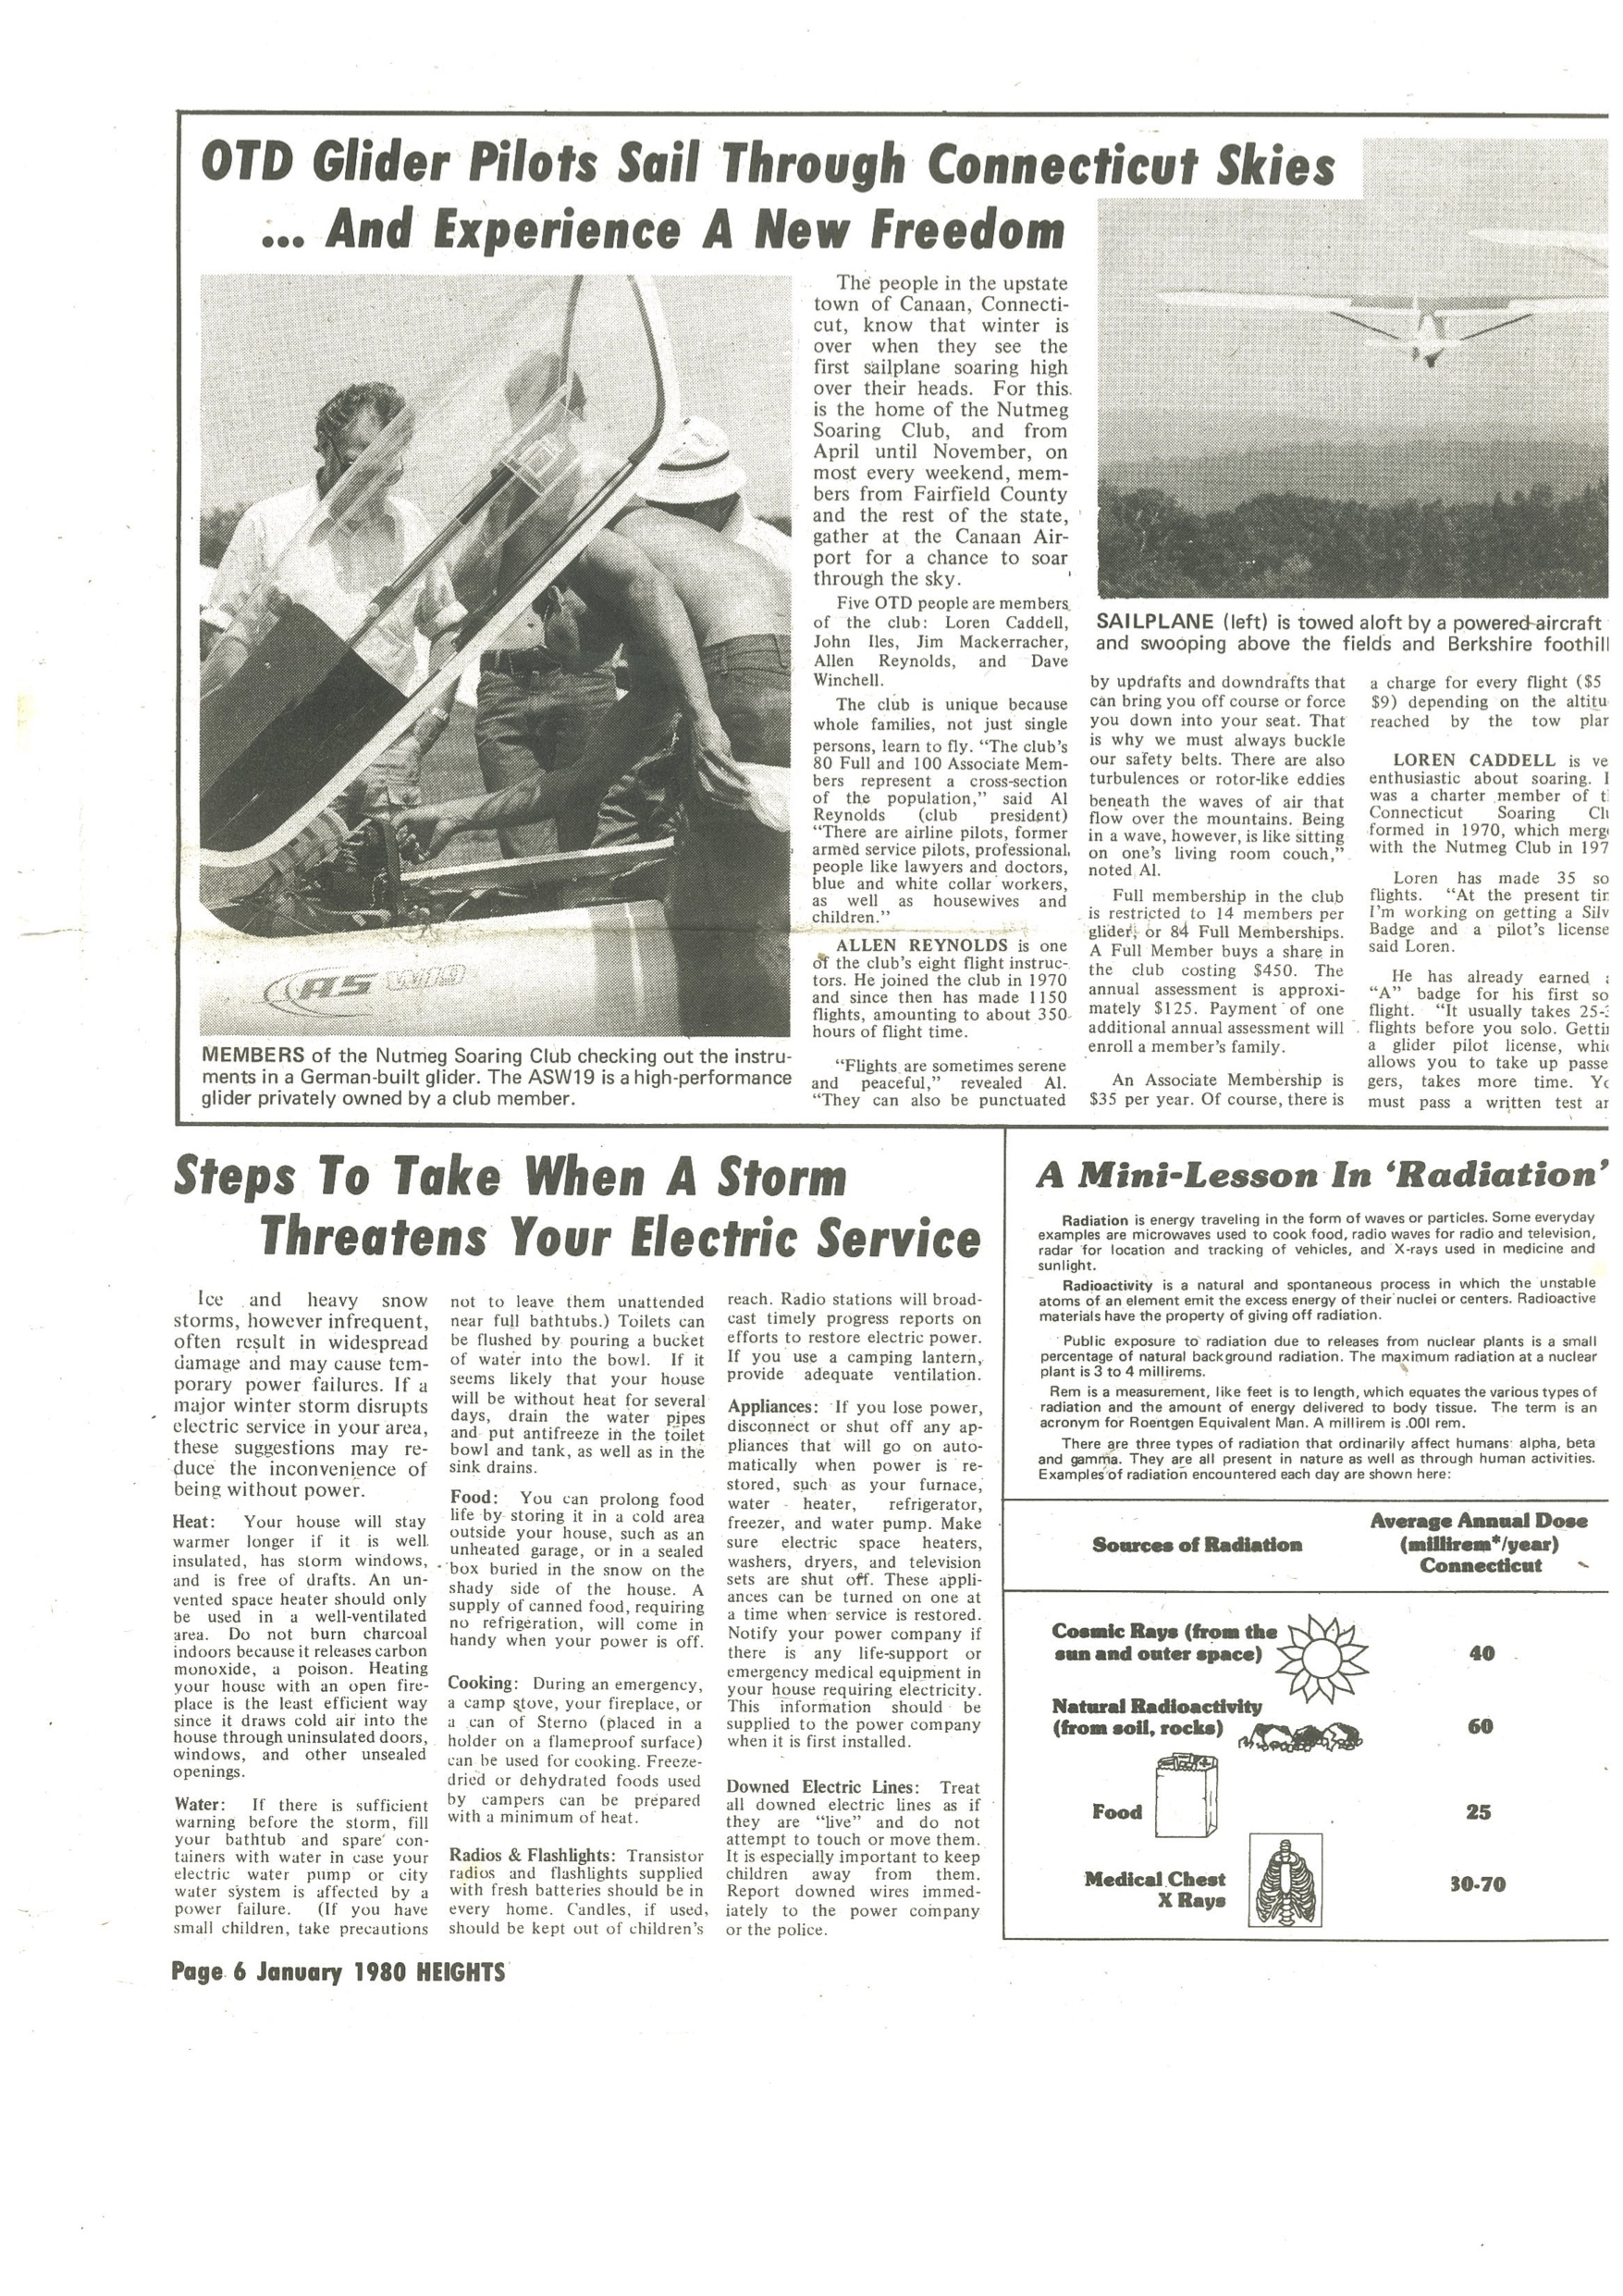 vol 13 num 4, page 6.jpg